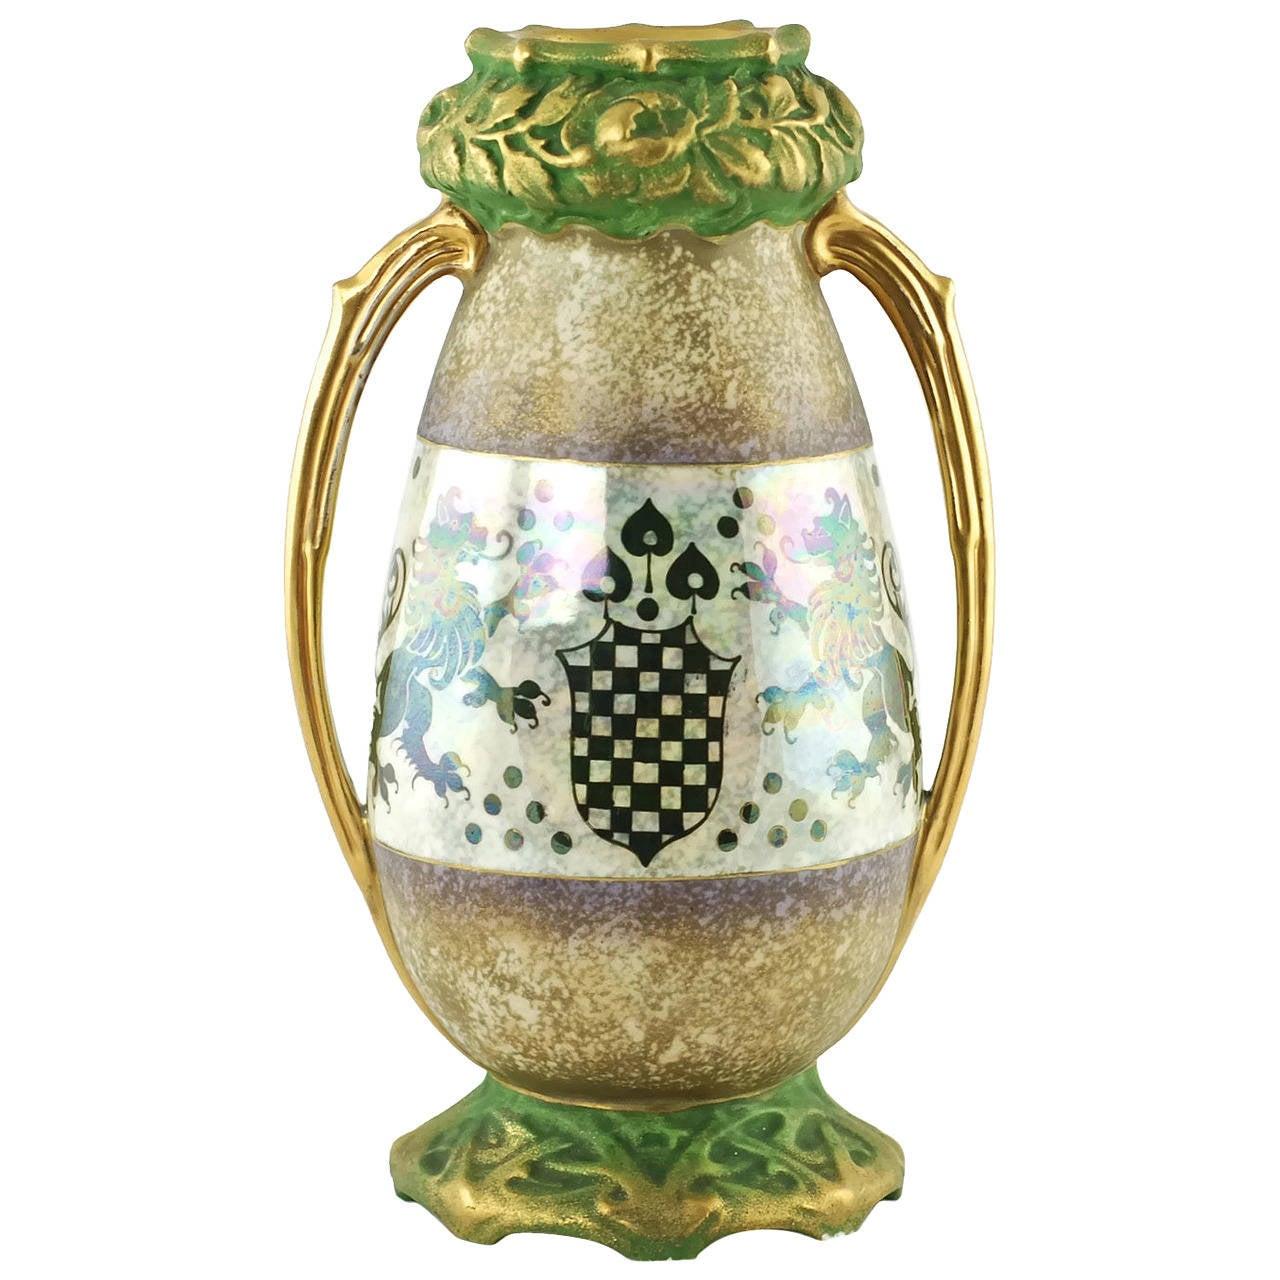 Riessner & Kessel Amphora Turn Teplitz Two-Handled Vase with Iridized Glaze